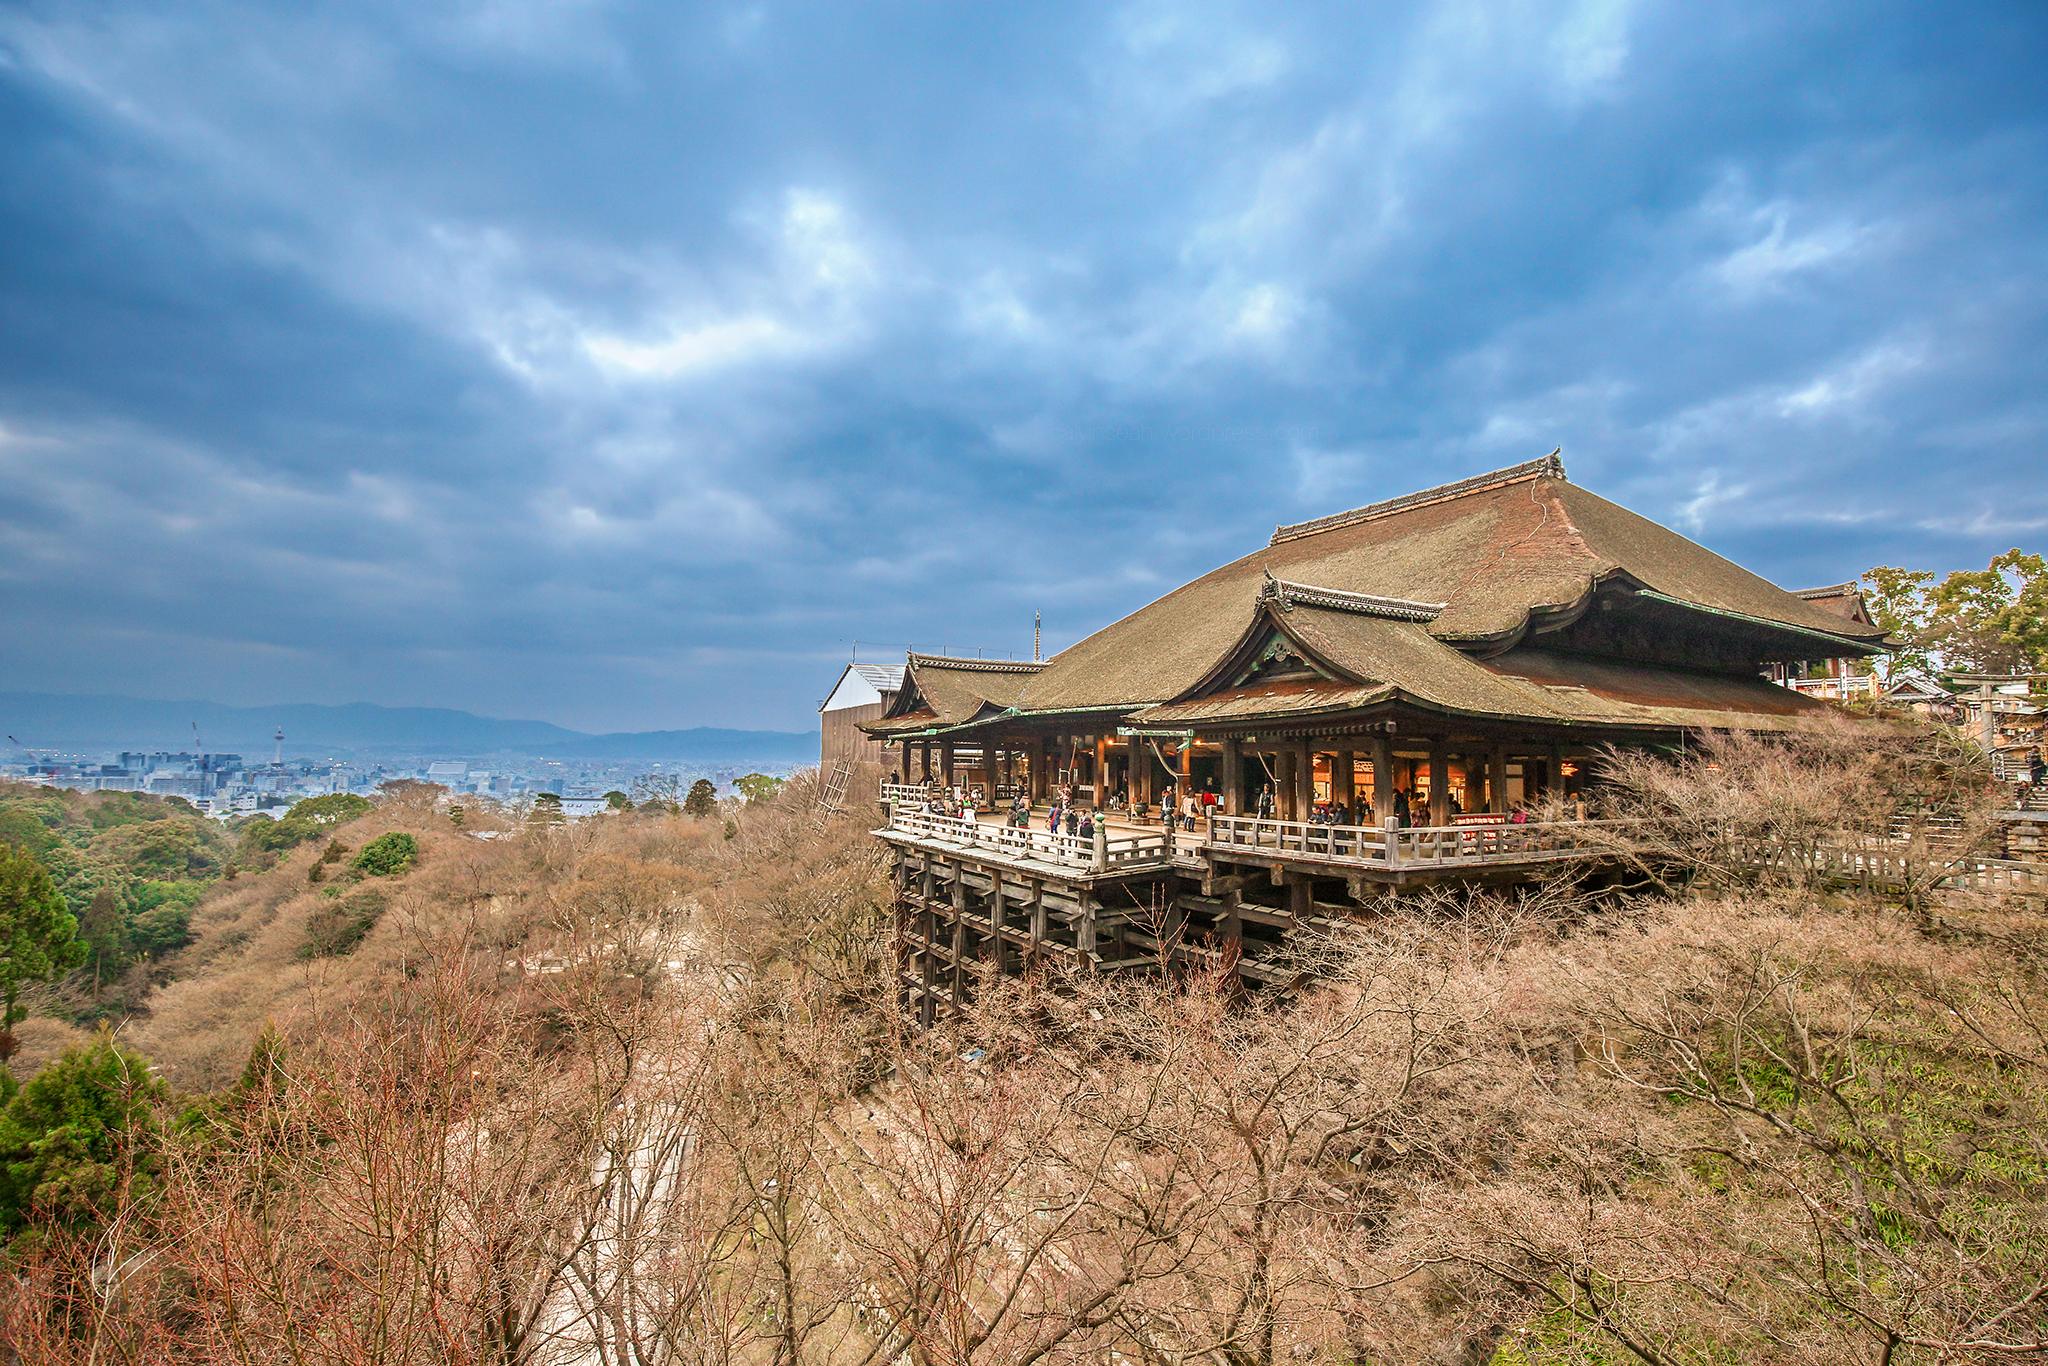 On the top, Kiyomizu-dera